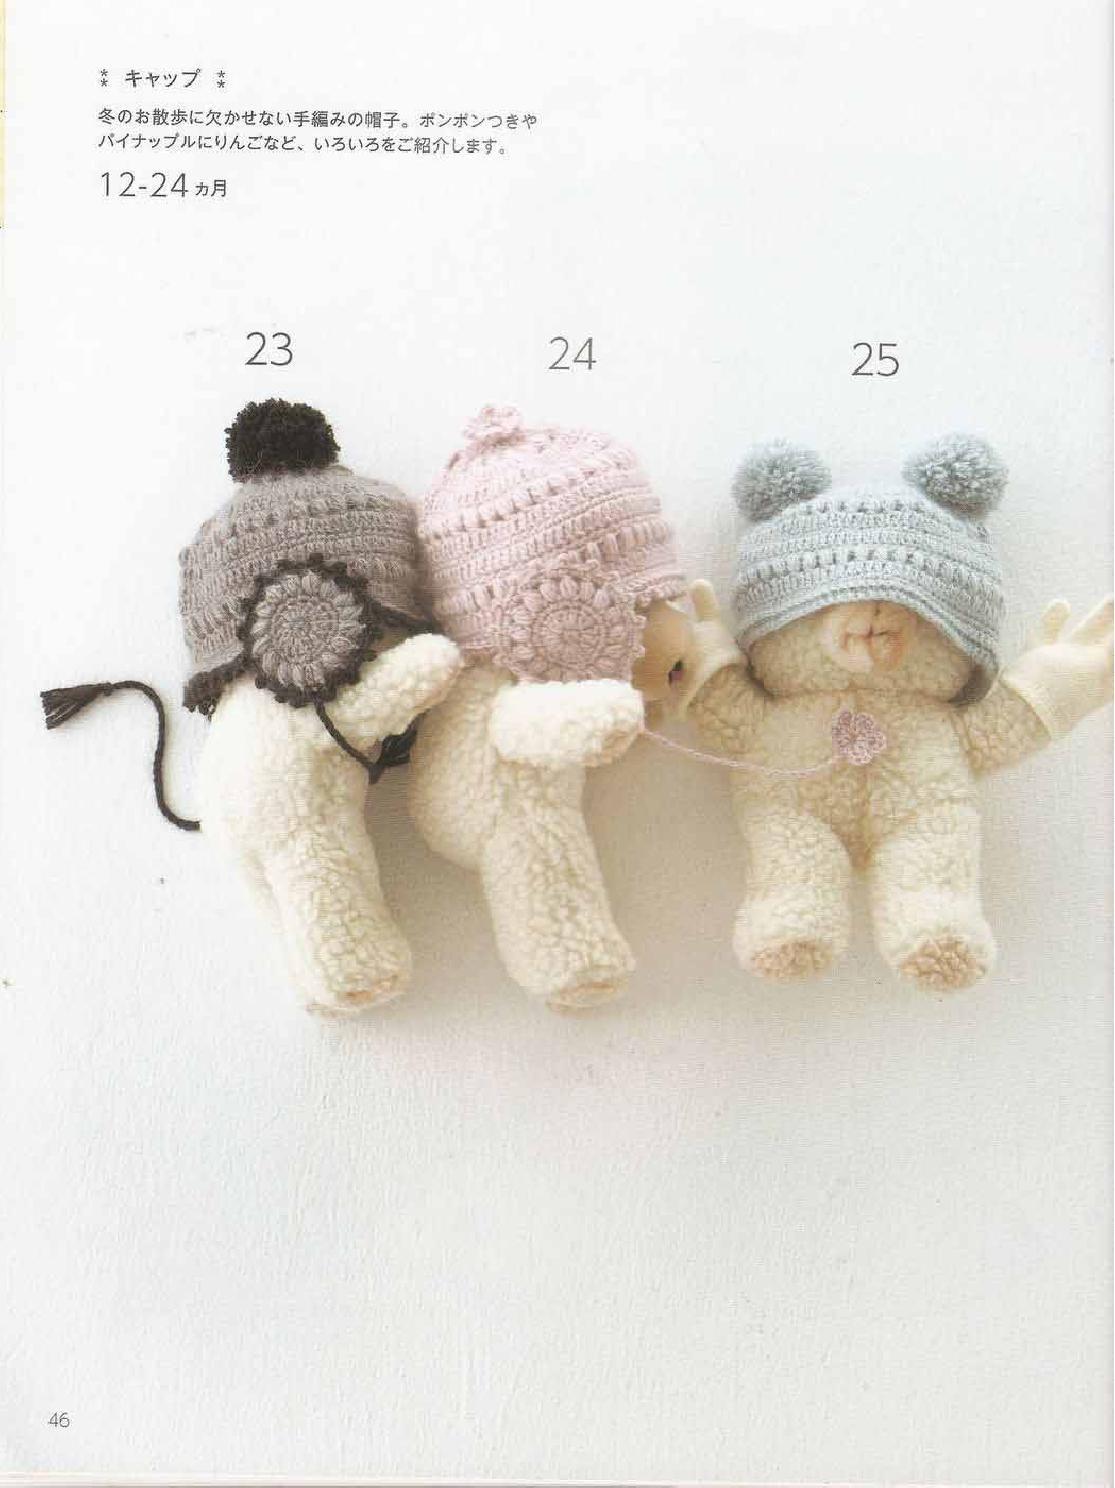 Happy crochet time for my baby | bebes | Pinterest | Croché, Bebe y ...